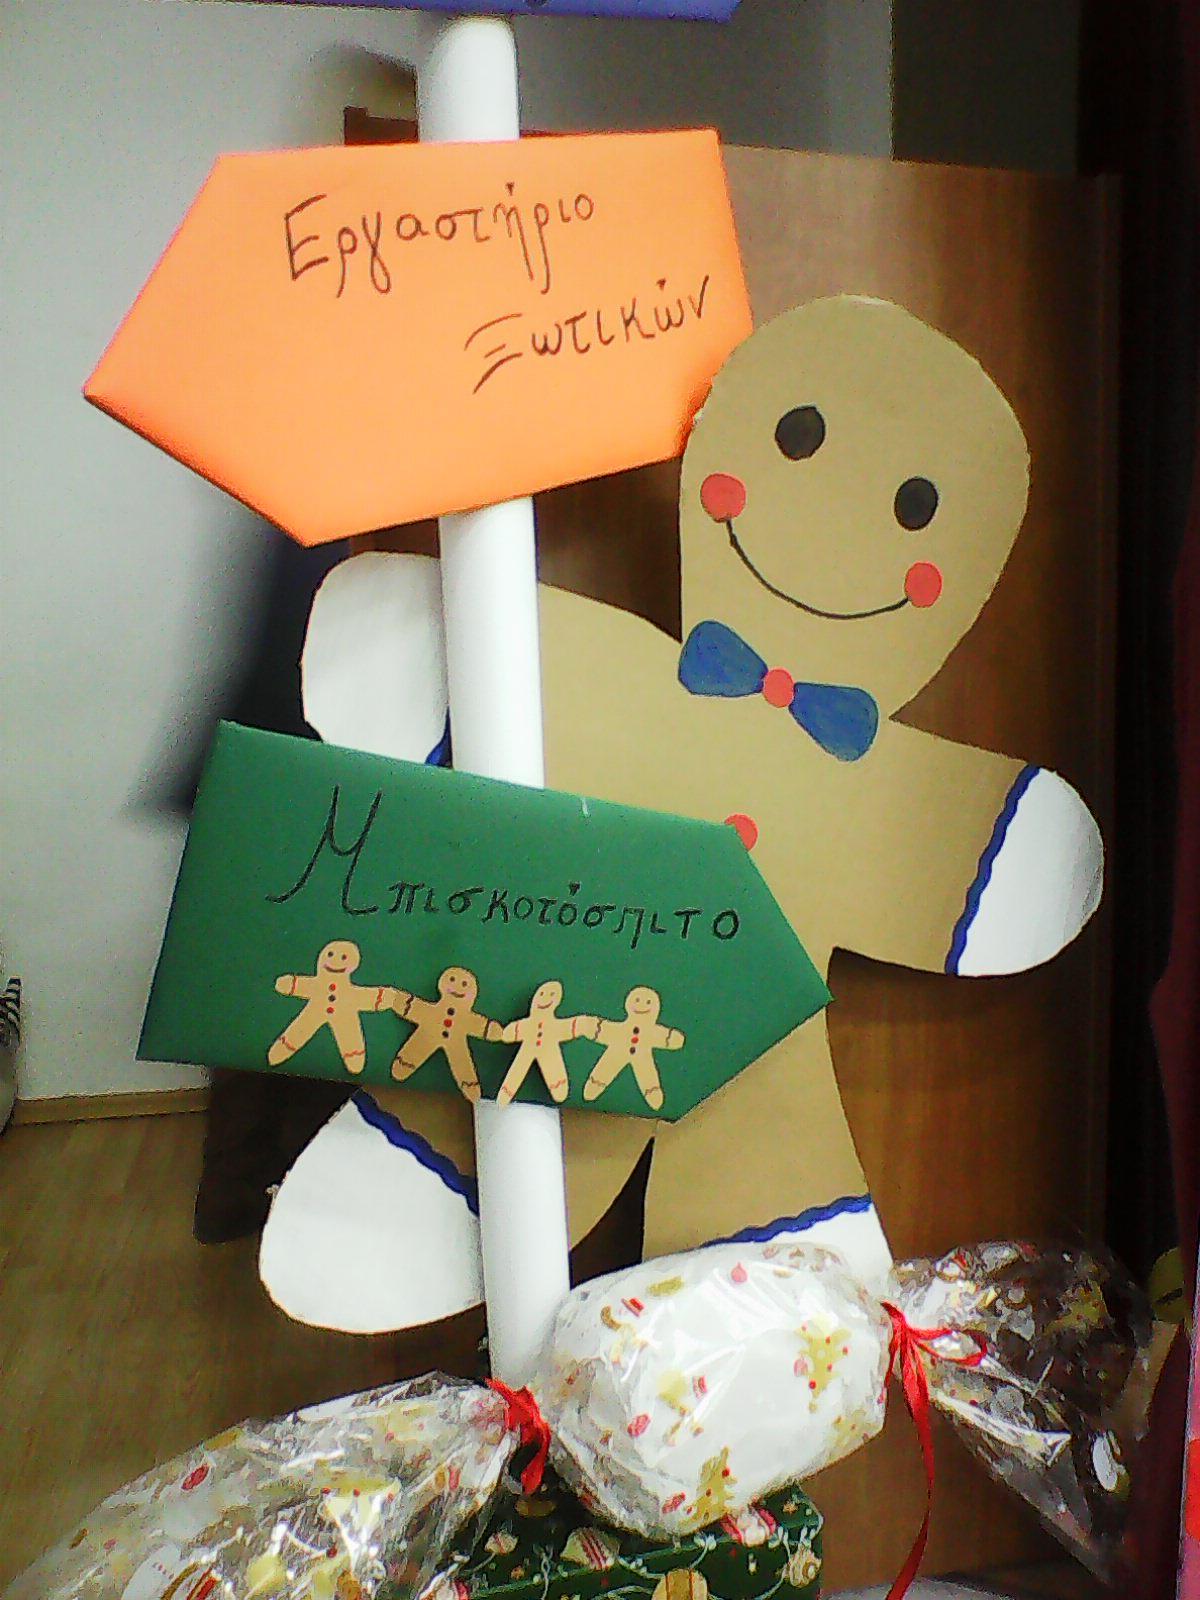 Xριστουγεννιάτικη γιορτή στο 5ο δημοτικό σχολείο Γρεβενών